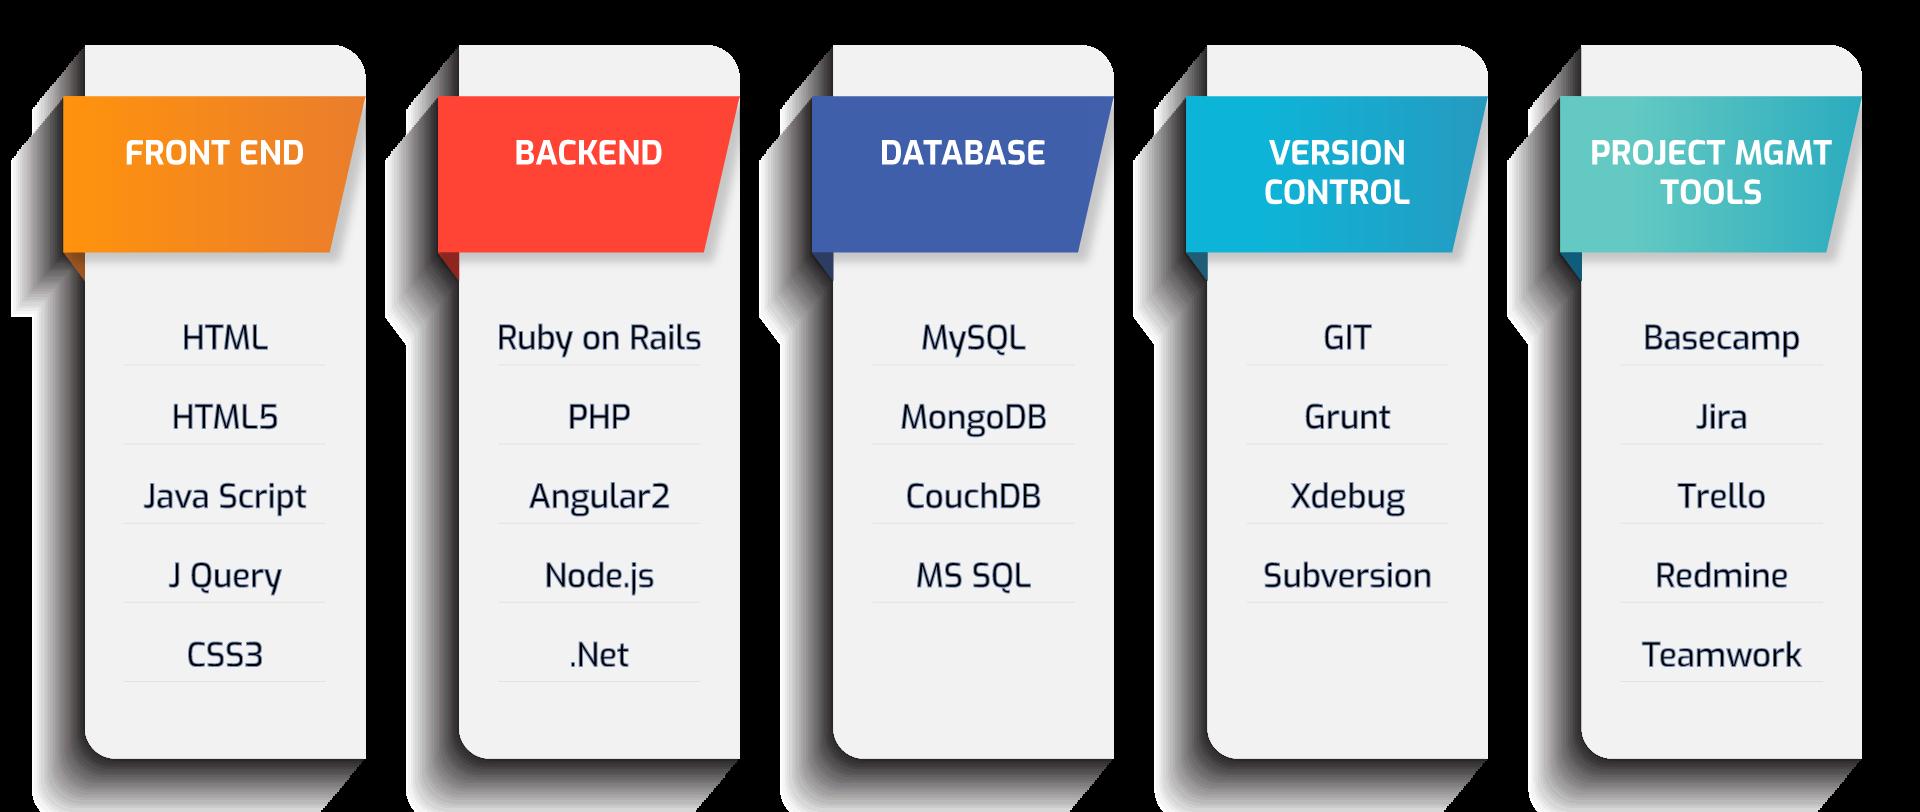 How To Become A Full Stack Web Developer? | Edureka